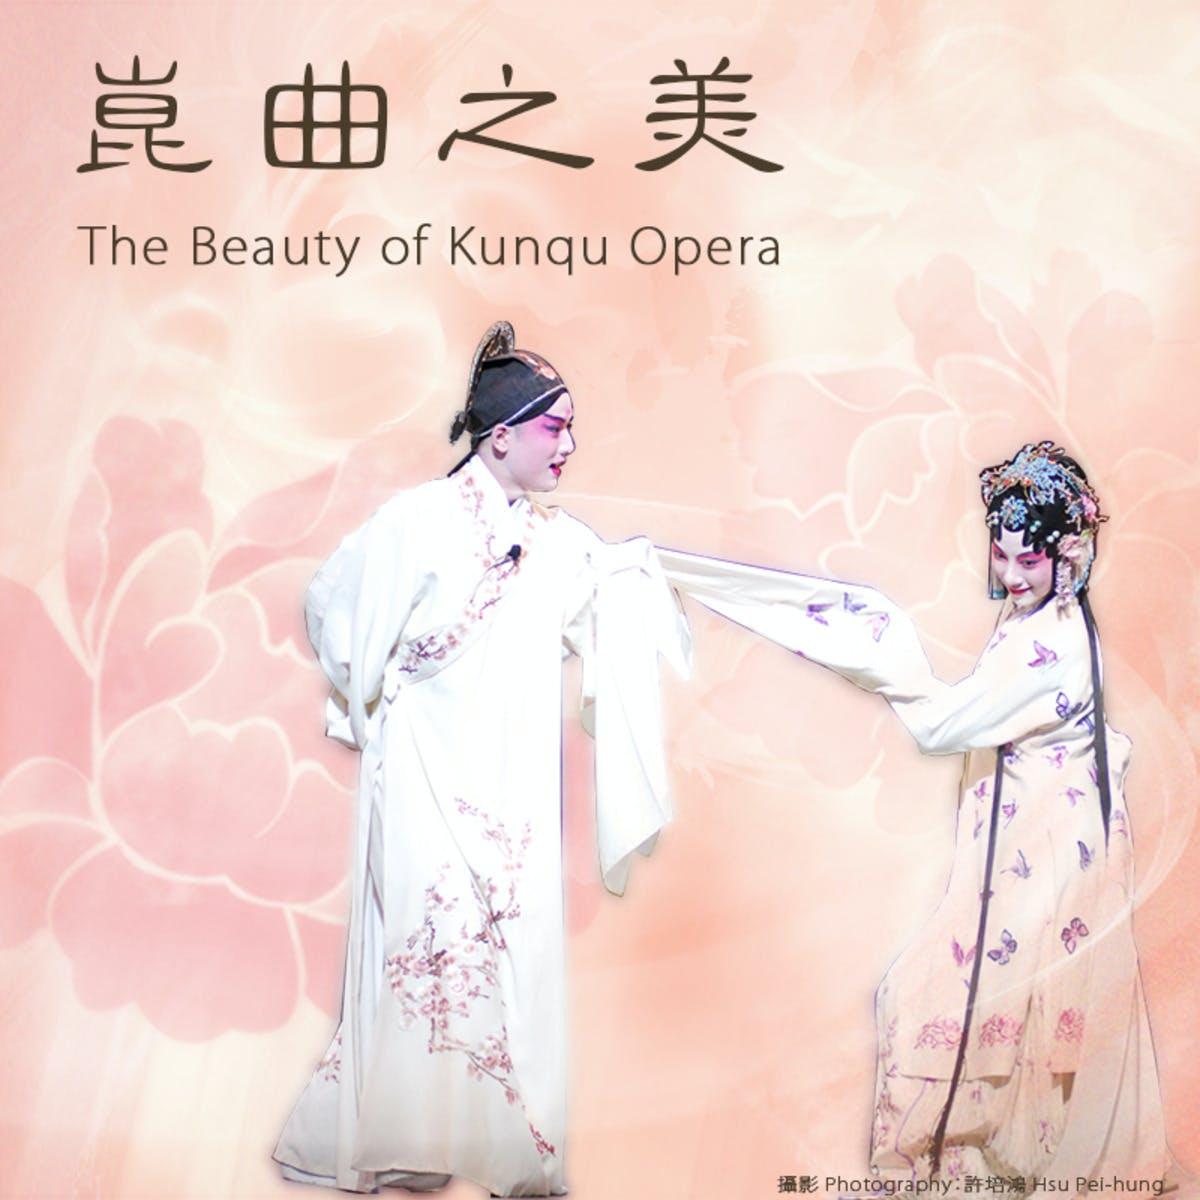 The Beauty of Kunqu Opera